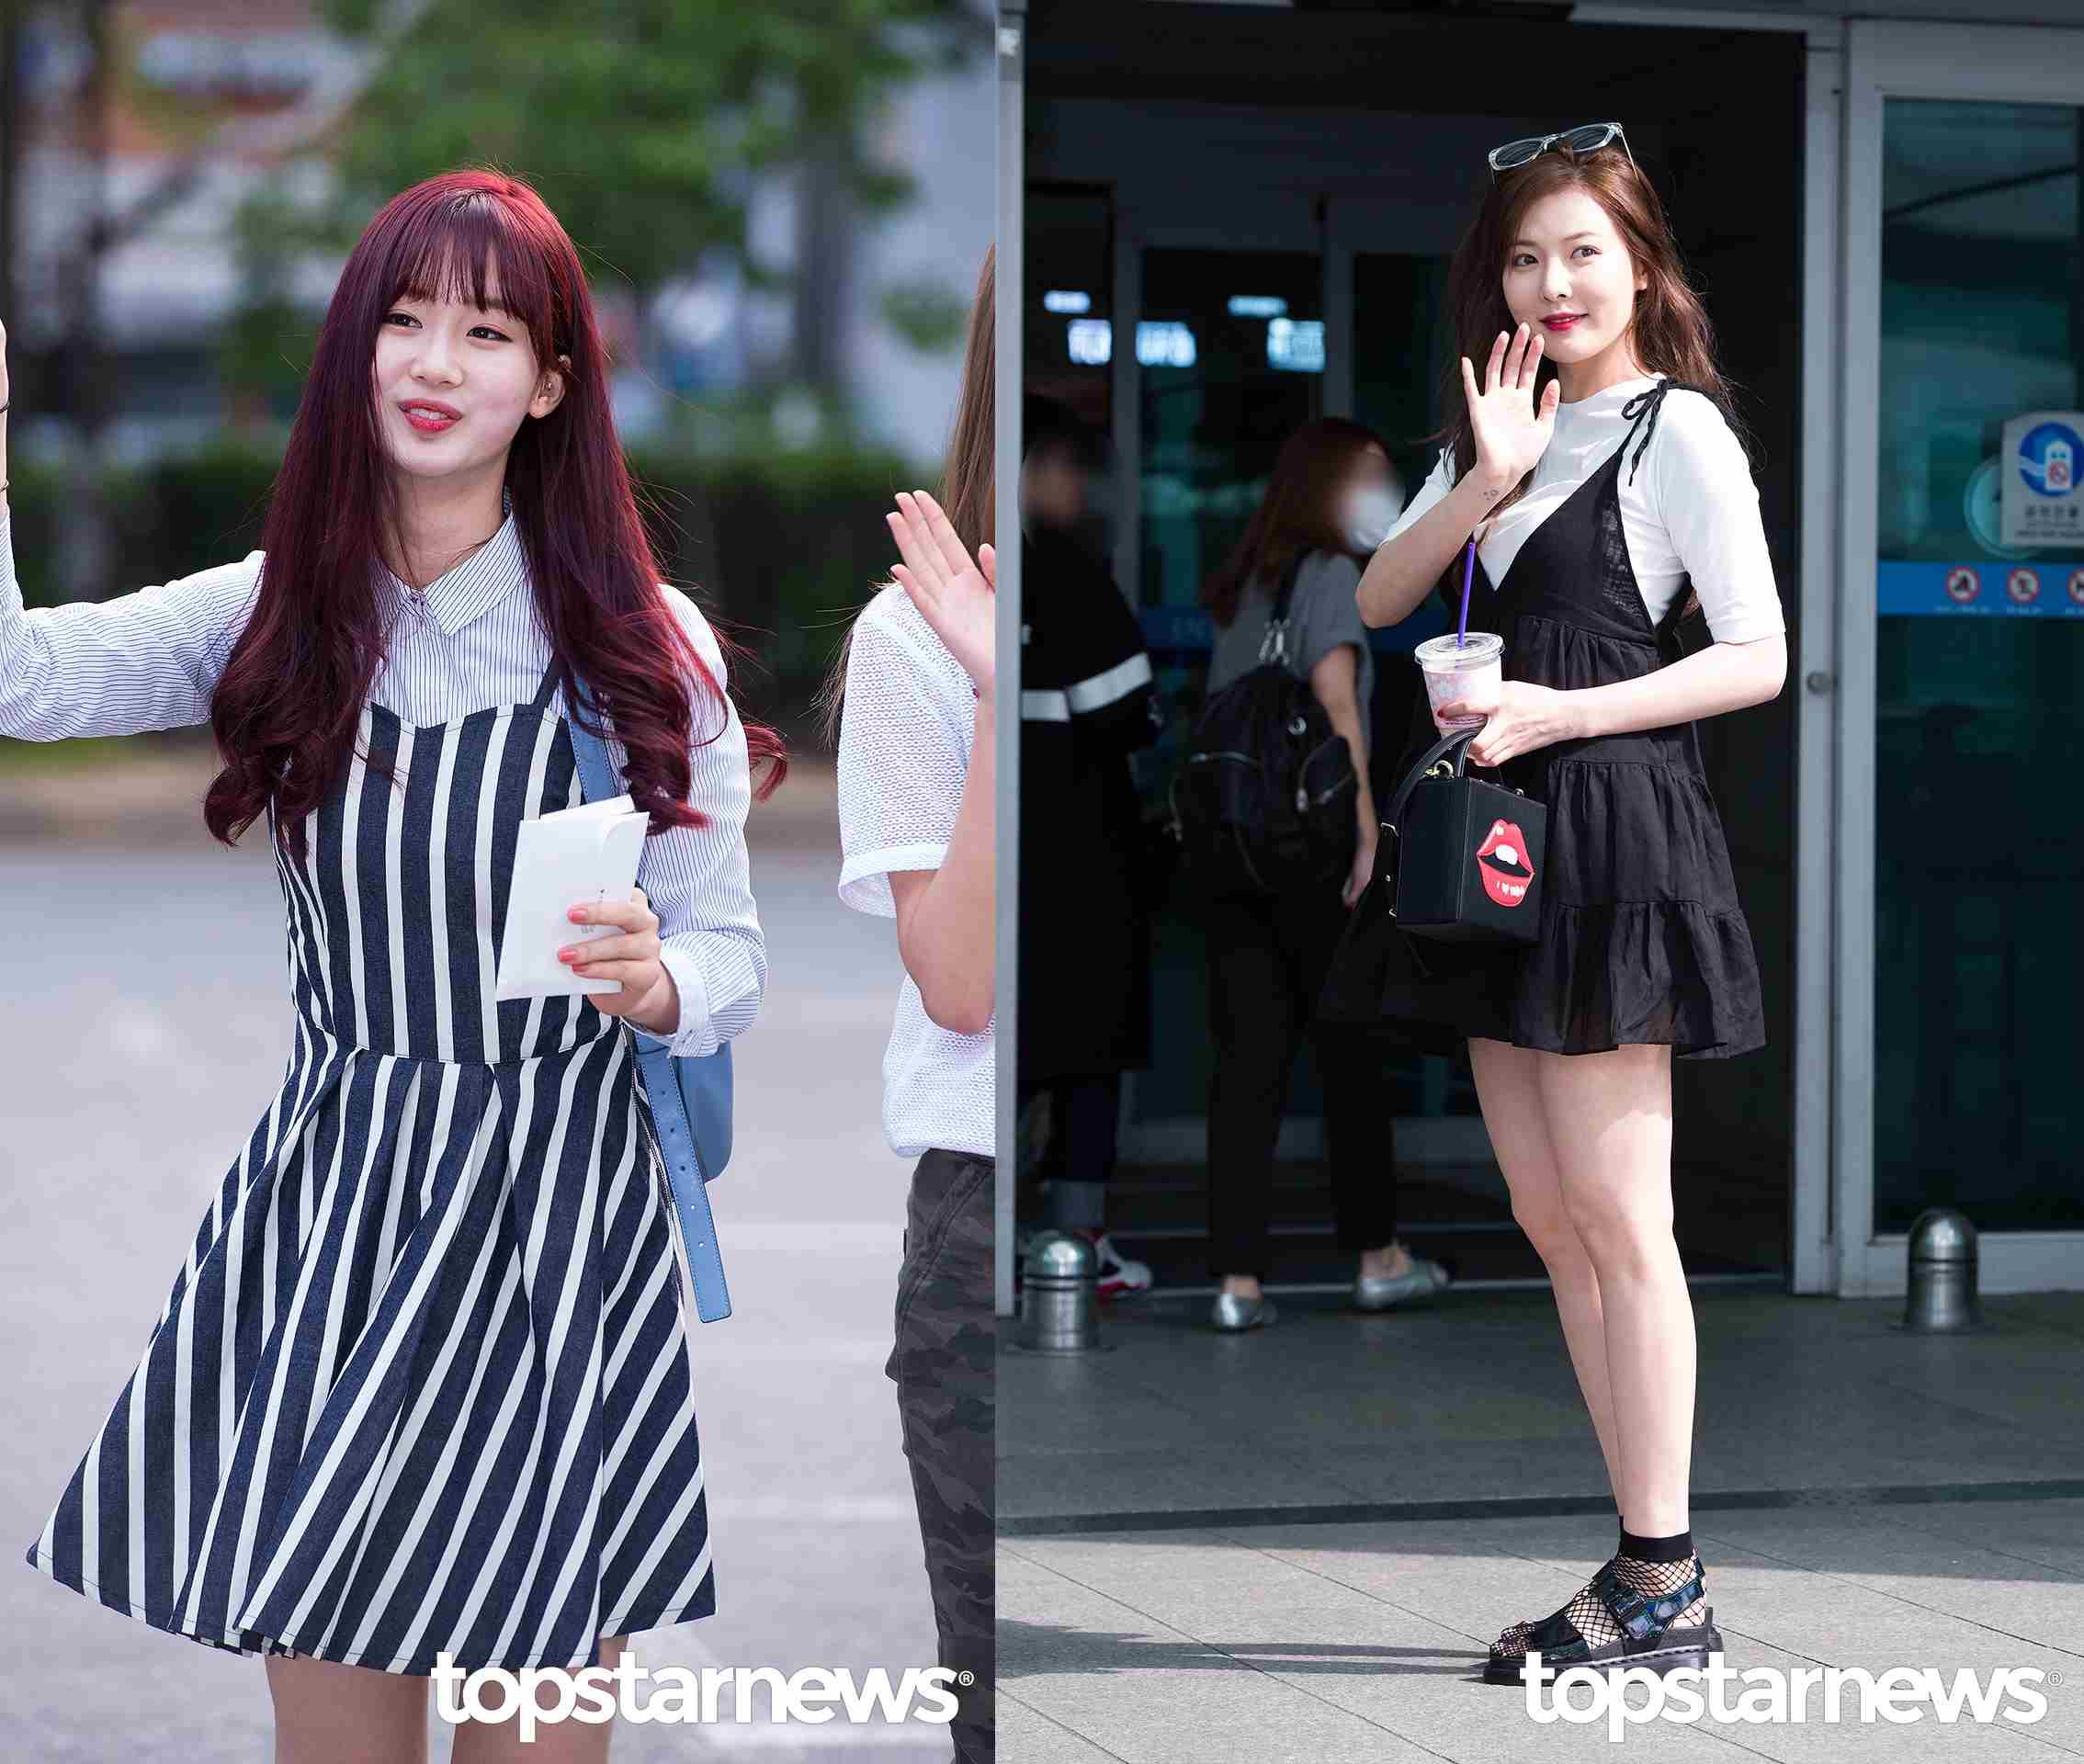 Style②細肩帶洋裝 除了普通的洋裝,今年春天開始細肩帶洋裝在韓國特別火熱,Berry Good多藝的格紋很有清純的學生氣息,而泫雅的黑色細肩帶連身裙搭配白素T+馬汀涼鞋+俏皮的小方包,展現出了不同於舞台上性感一面的青春活潑的氣息。